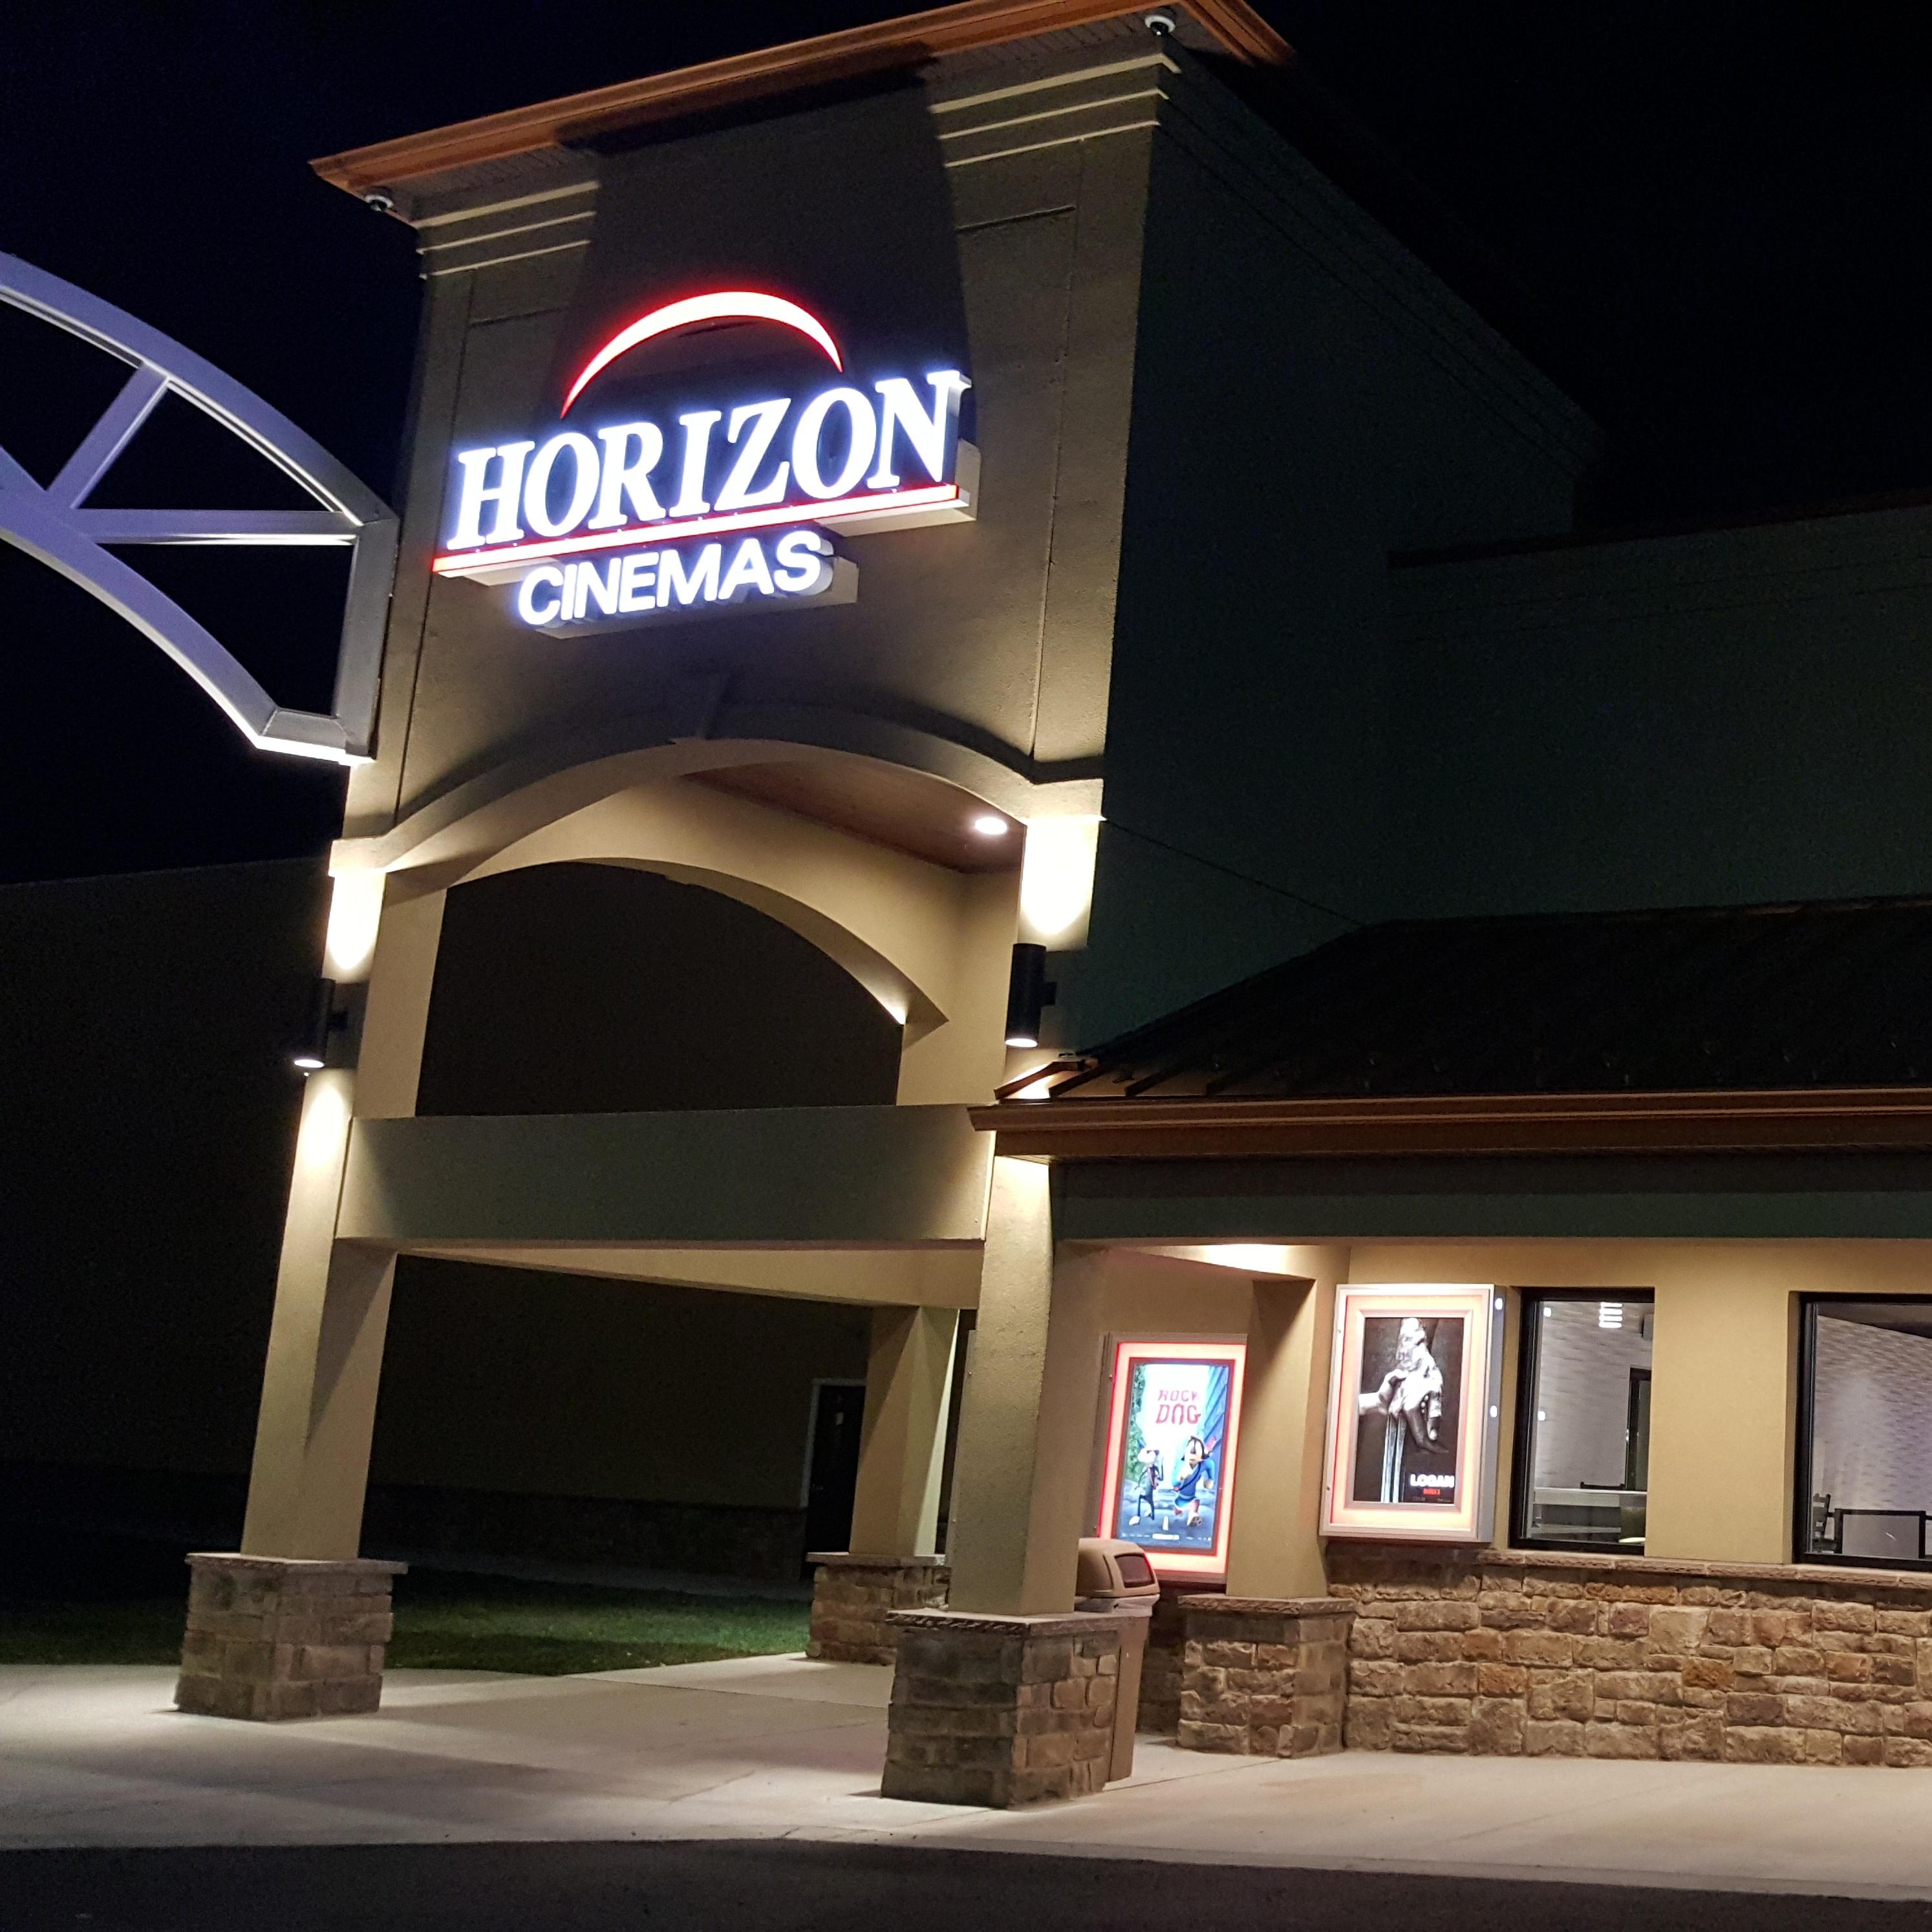 REVIEW: Horizon Cinemas is Now Open in Fallston!